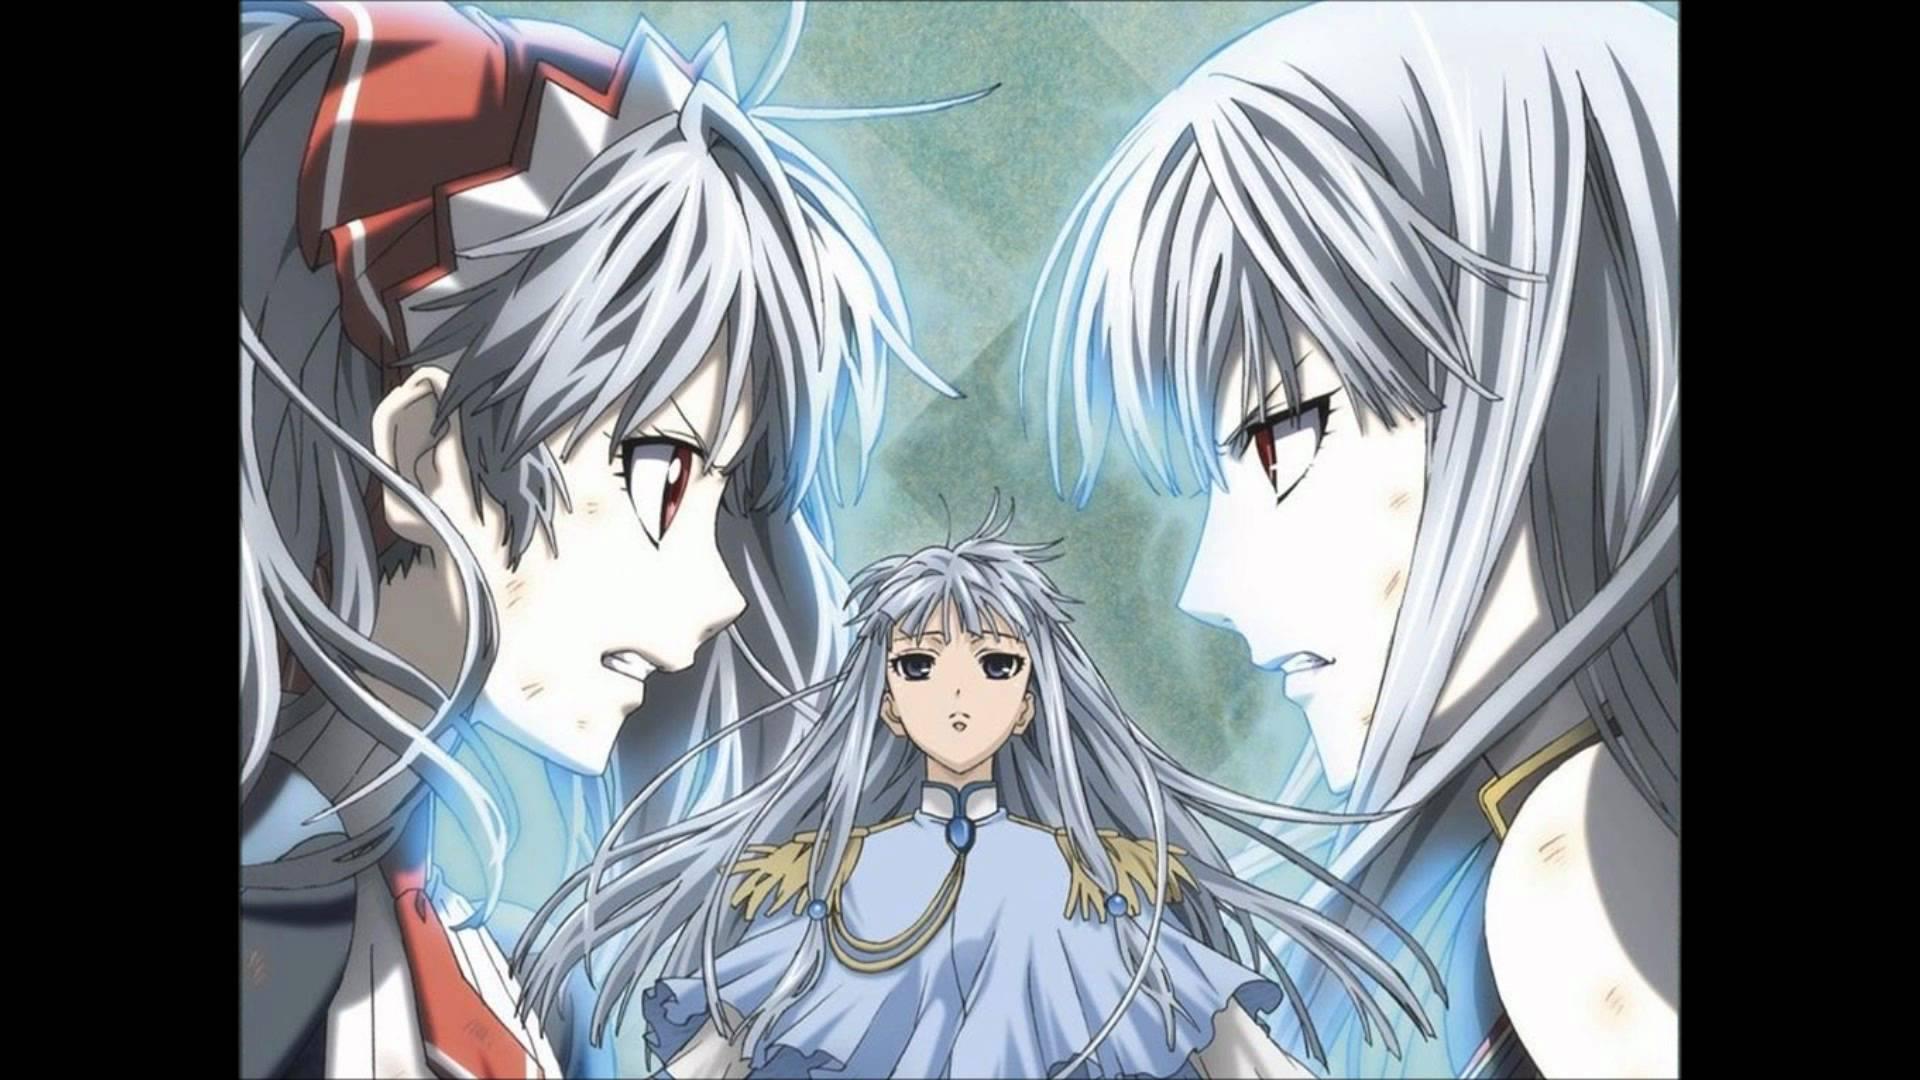 best supernatural anime of all timemaxresdefaultjpg oSDocyc8